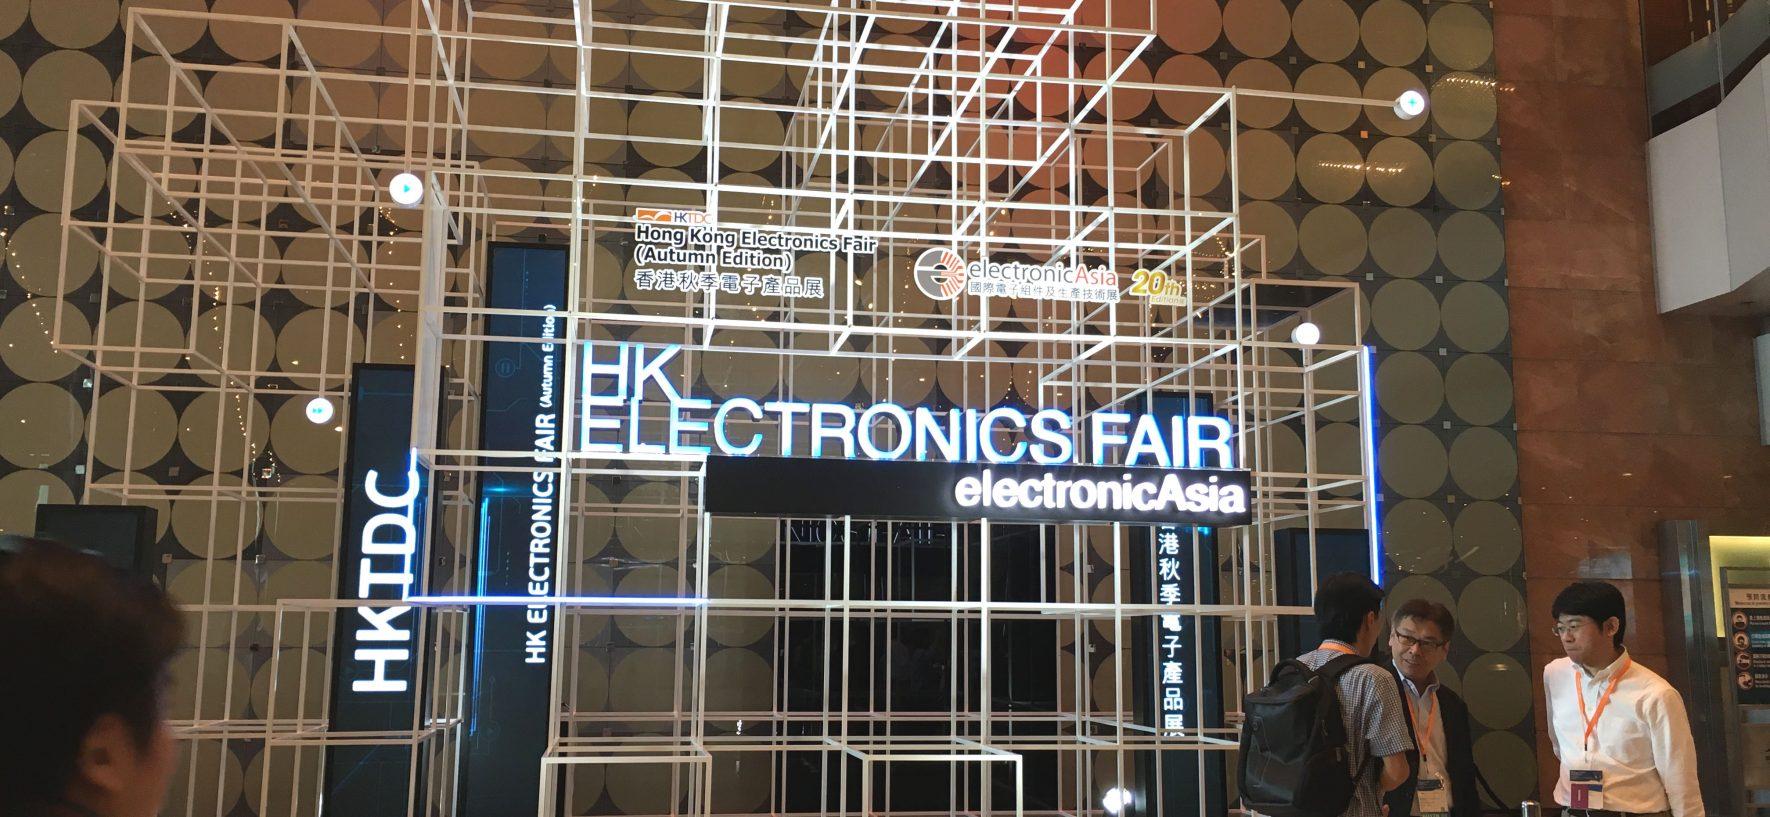 Hong Kong Electronics Fair Autumn Edition 2016